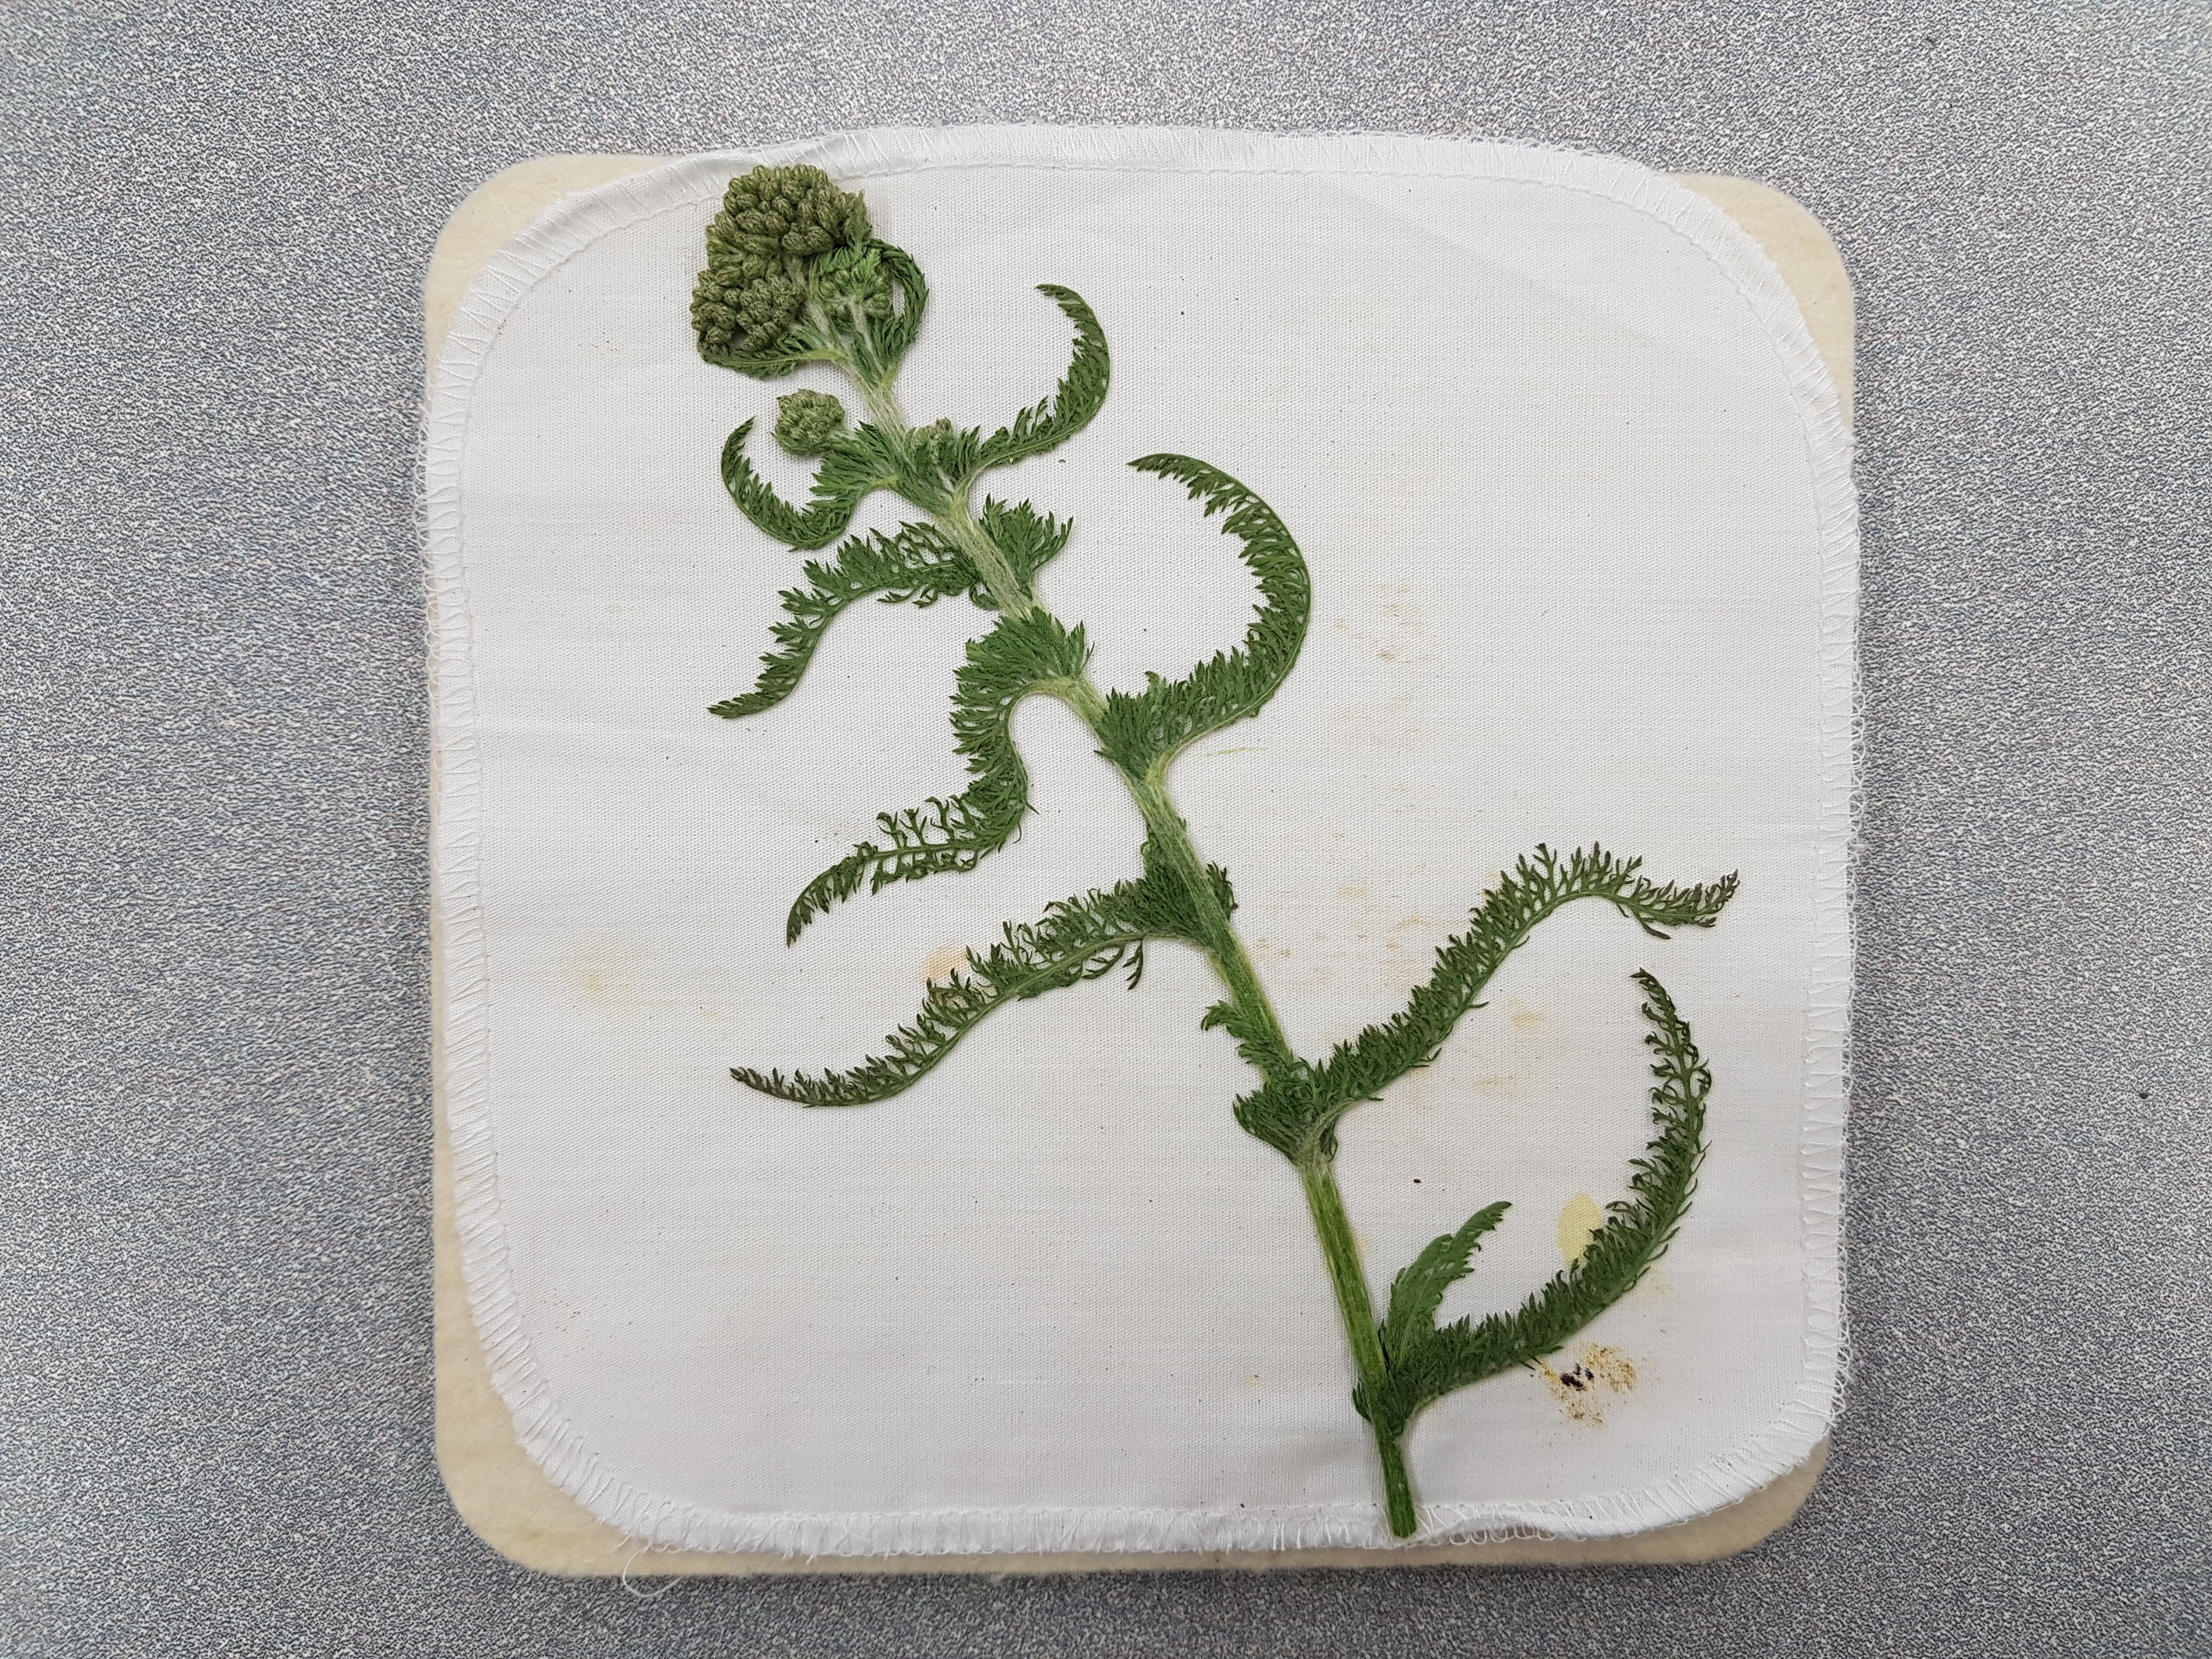 flattend plant